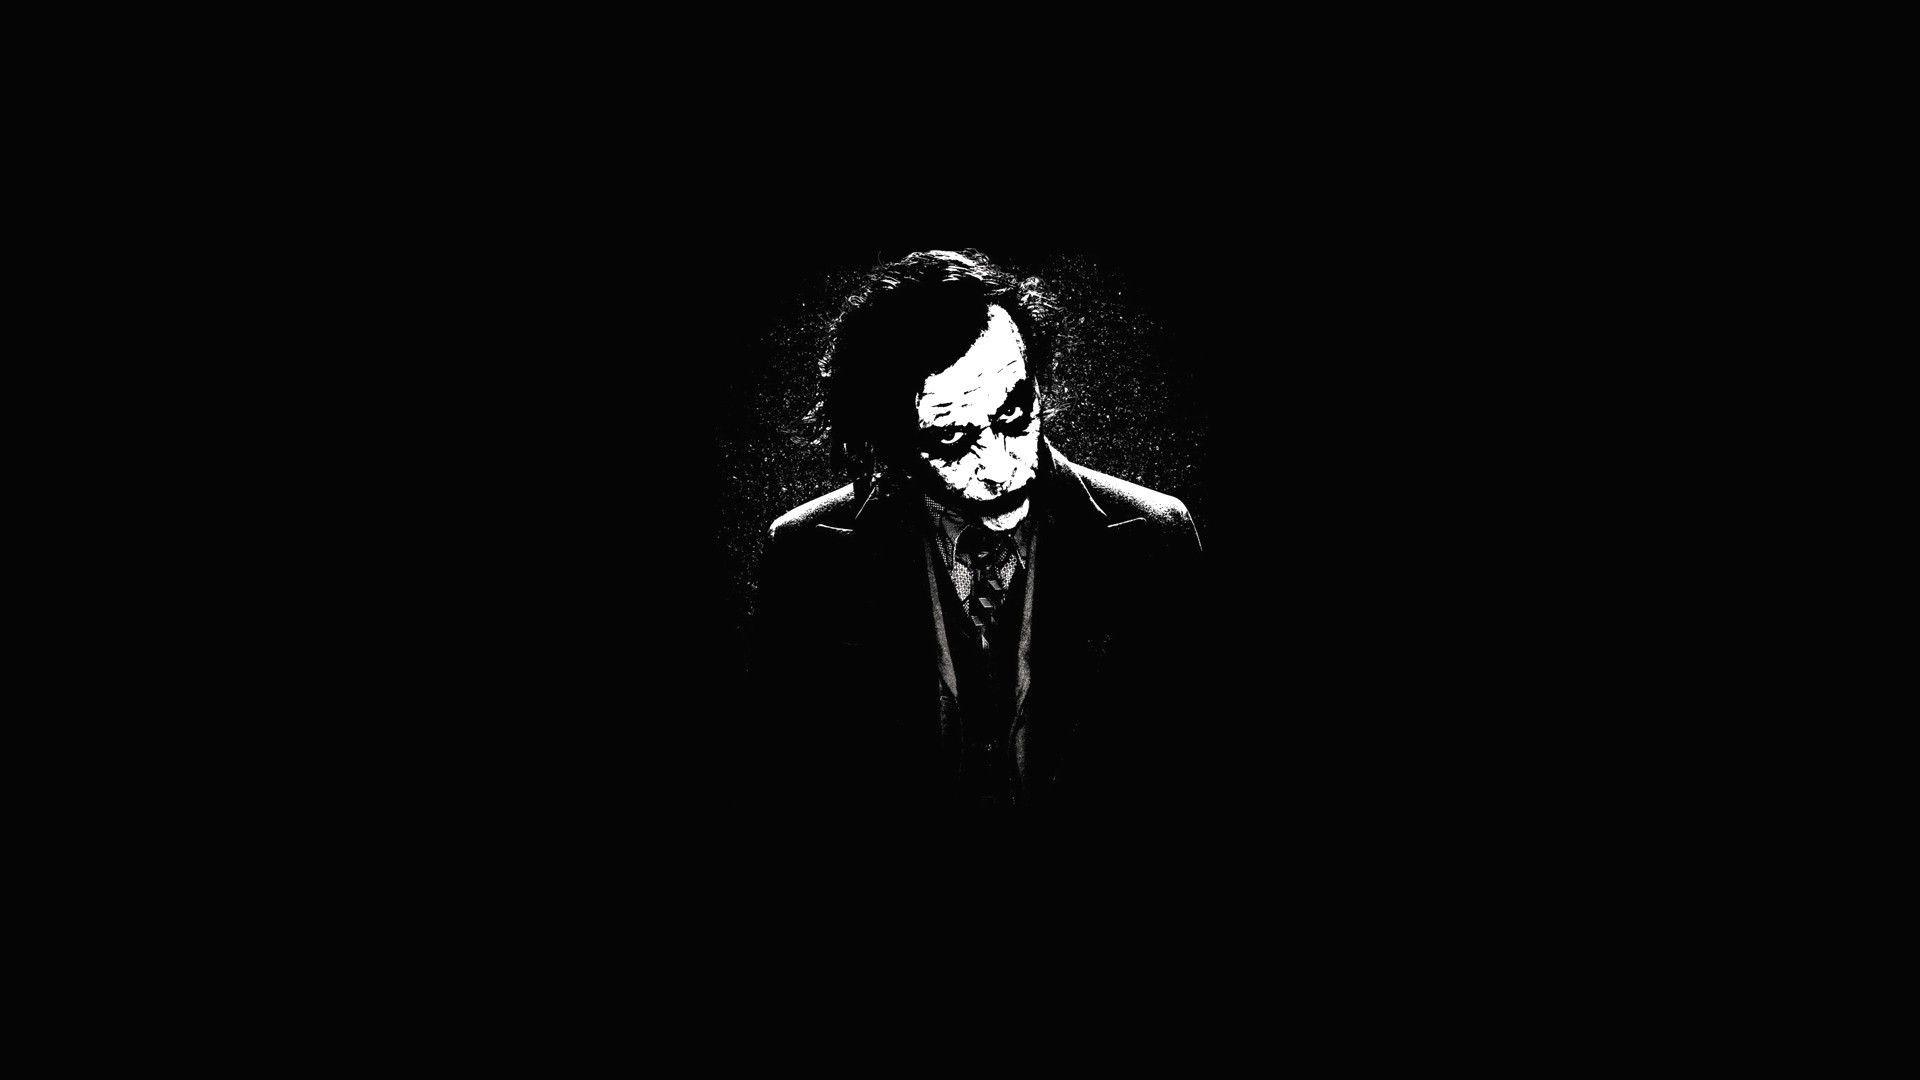 The Joker, the dark knight, heath ledger, digital-art, .